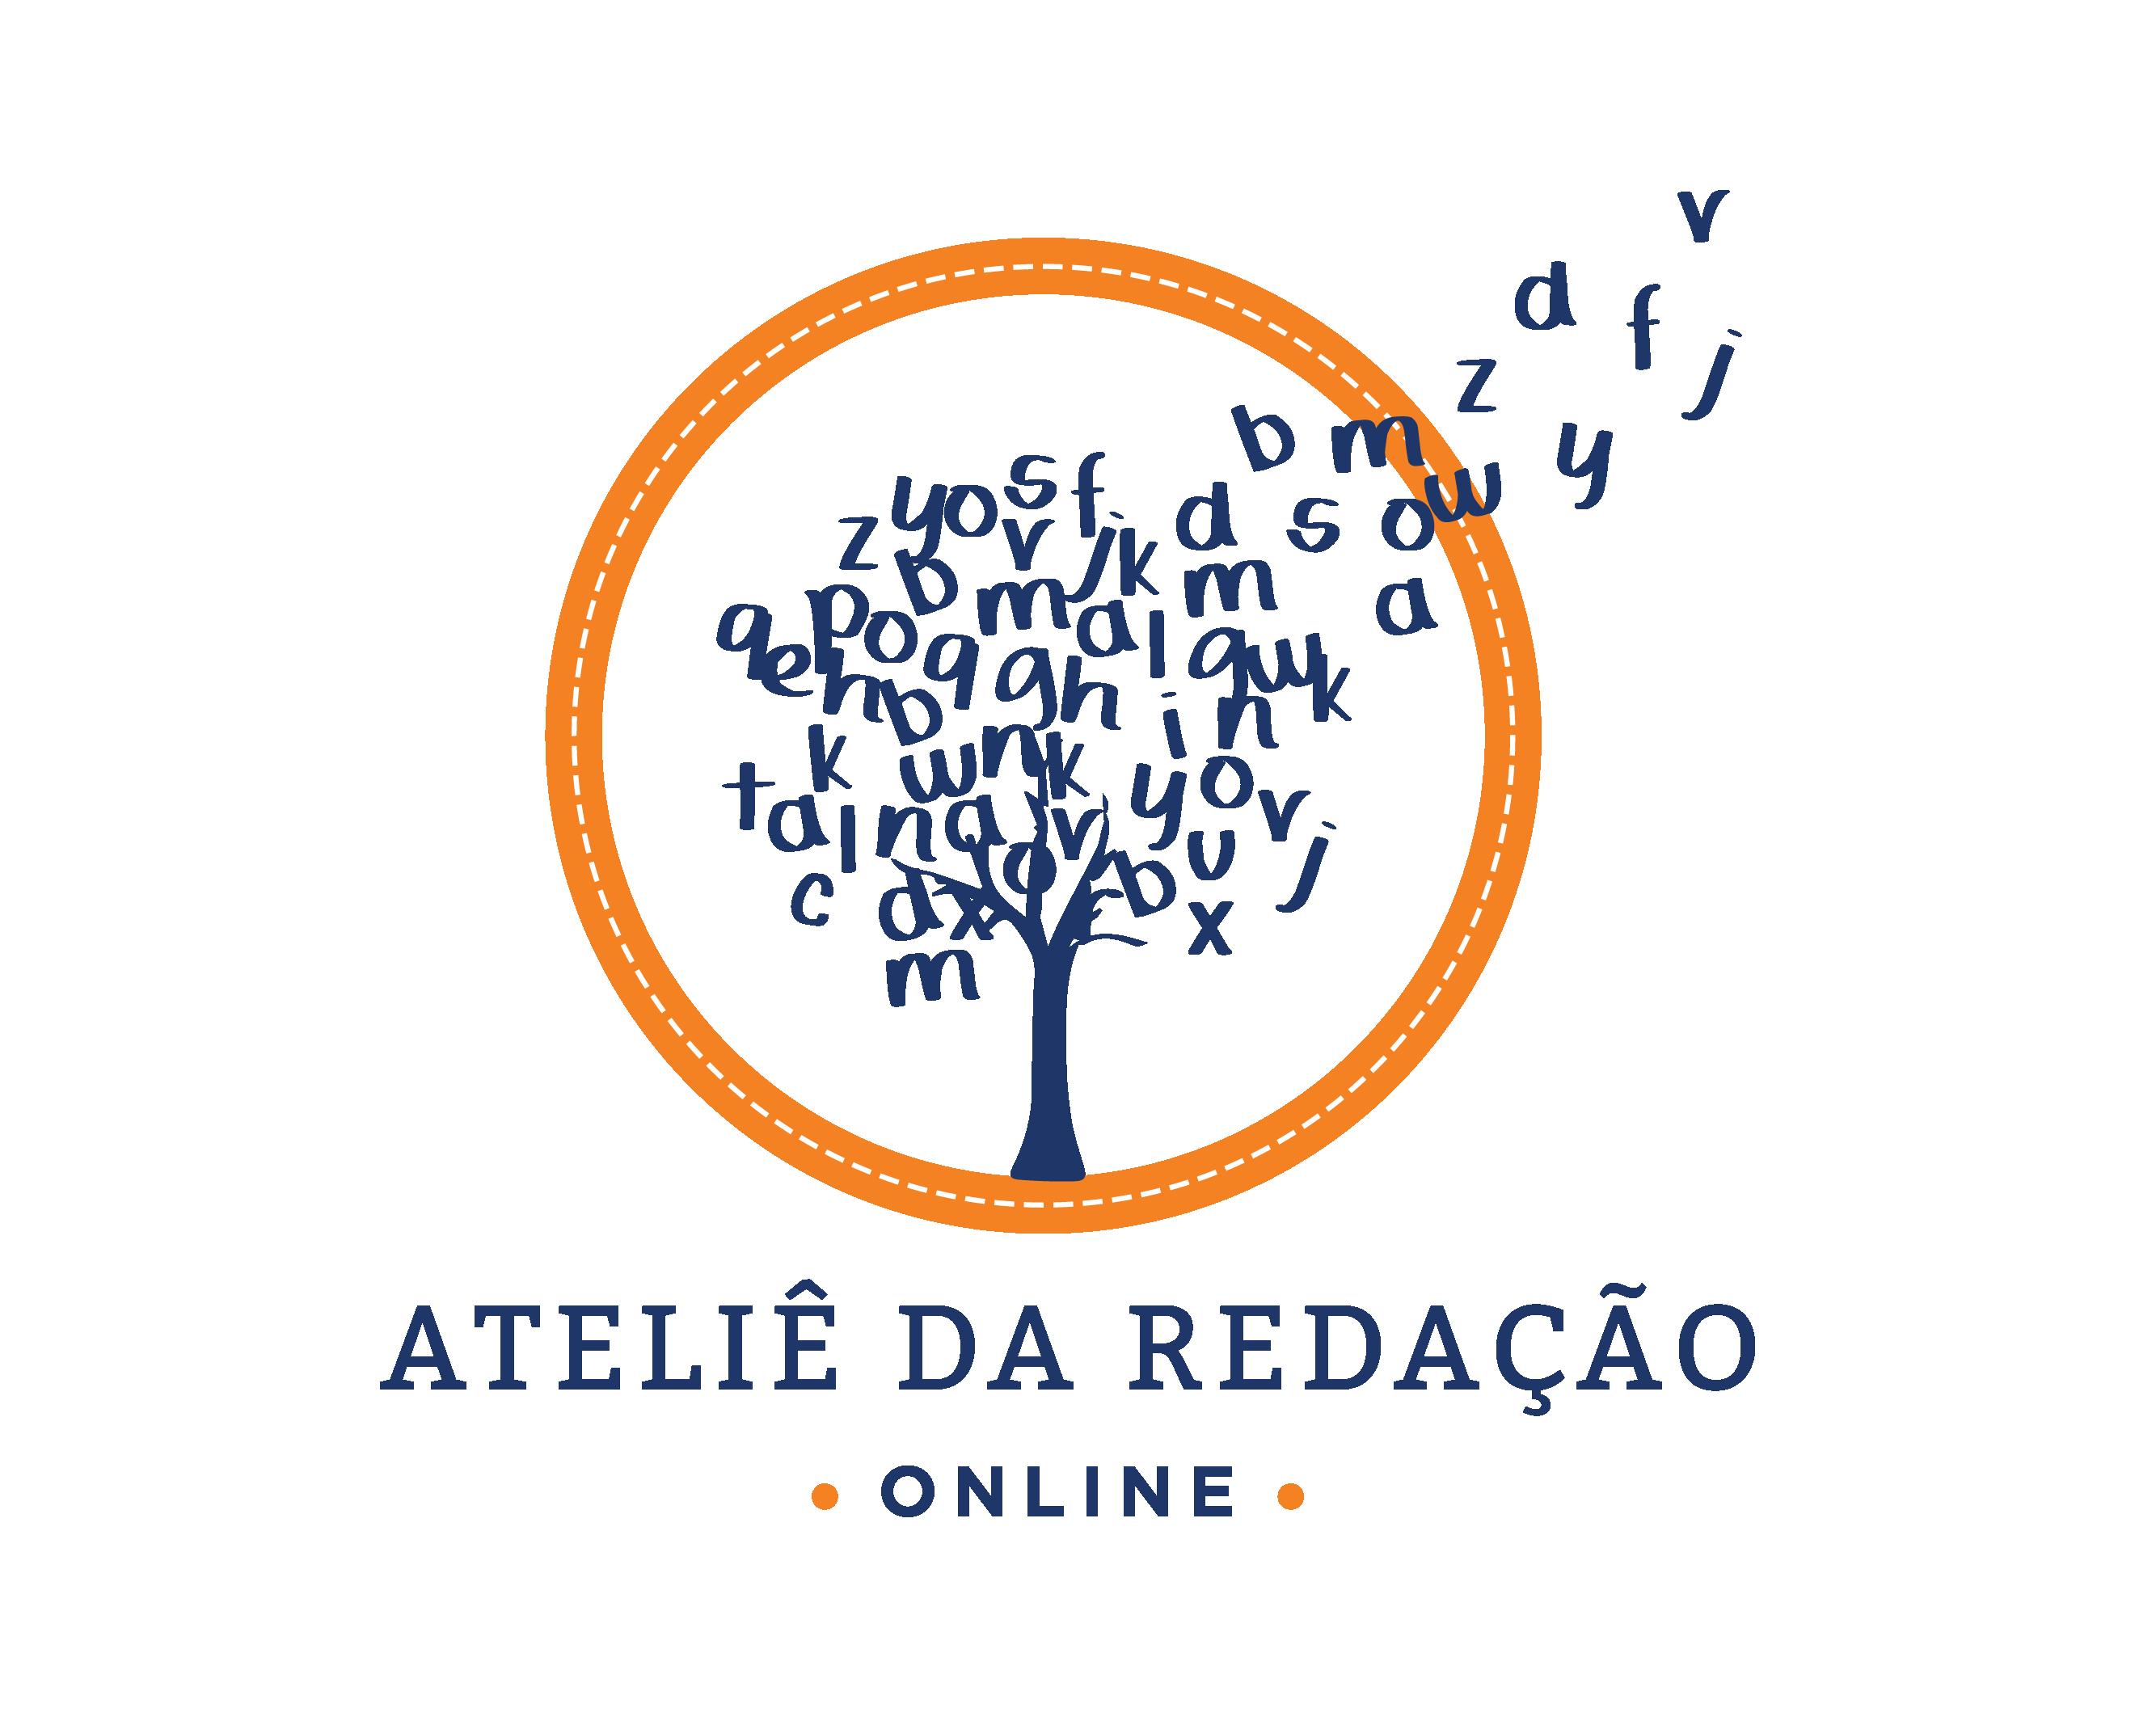 logo_atelie_redacao_online-01-1